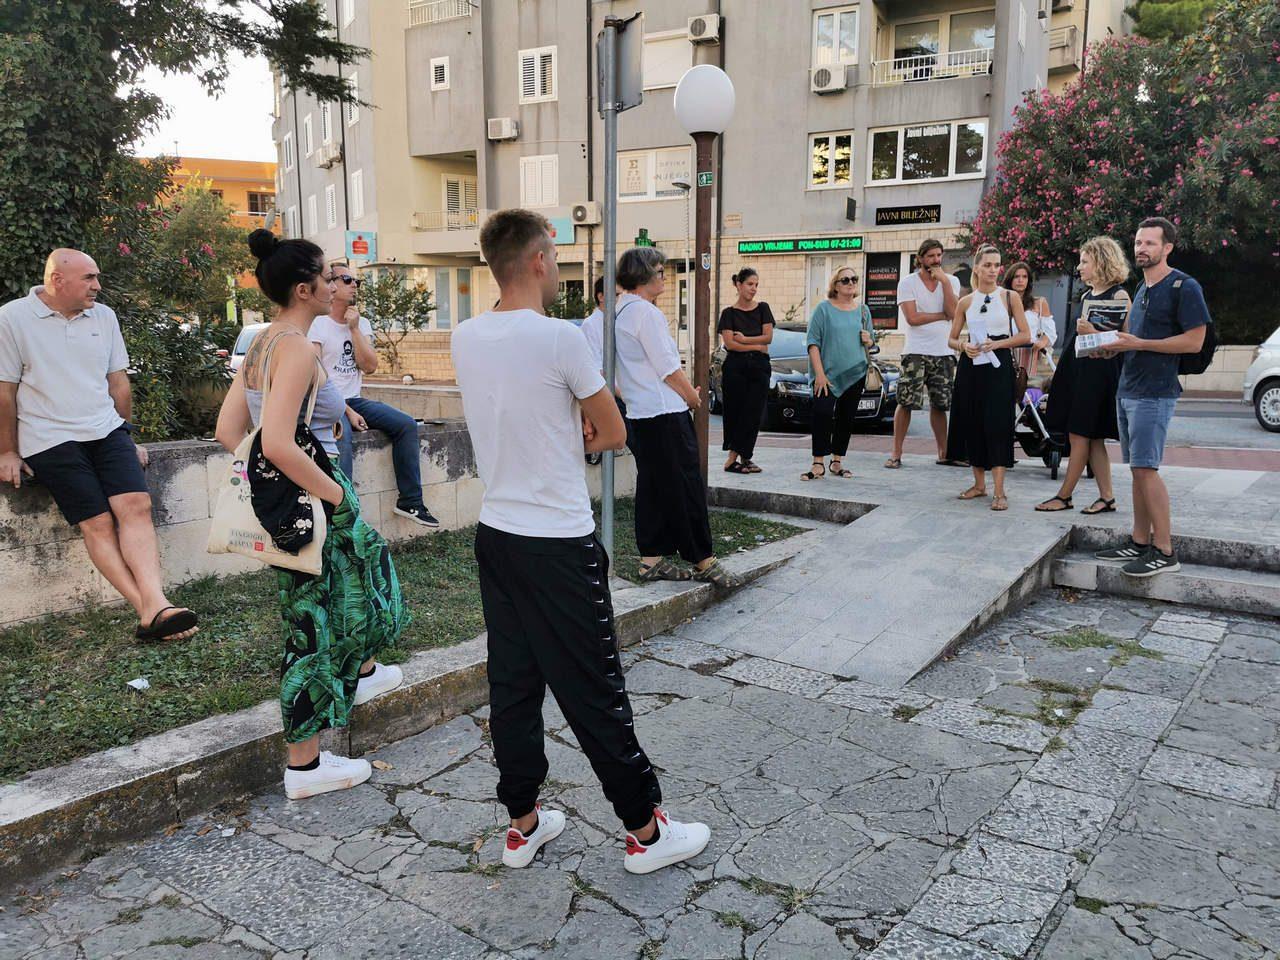 moderna_makarska-udruga_kacic-2019-05